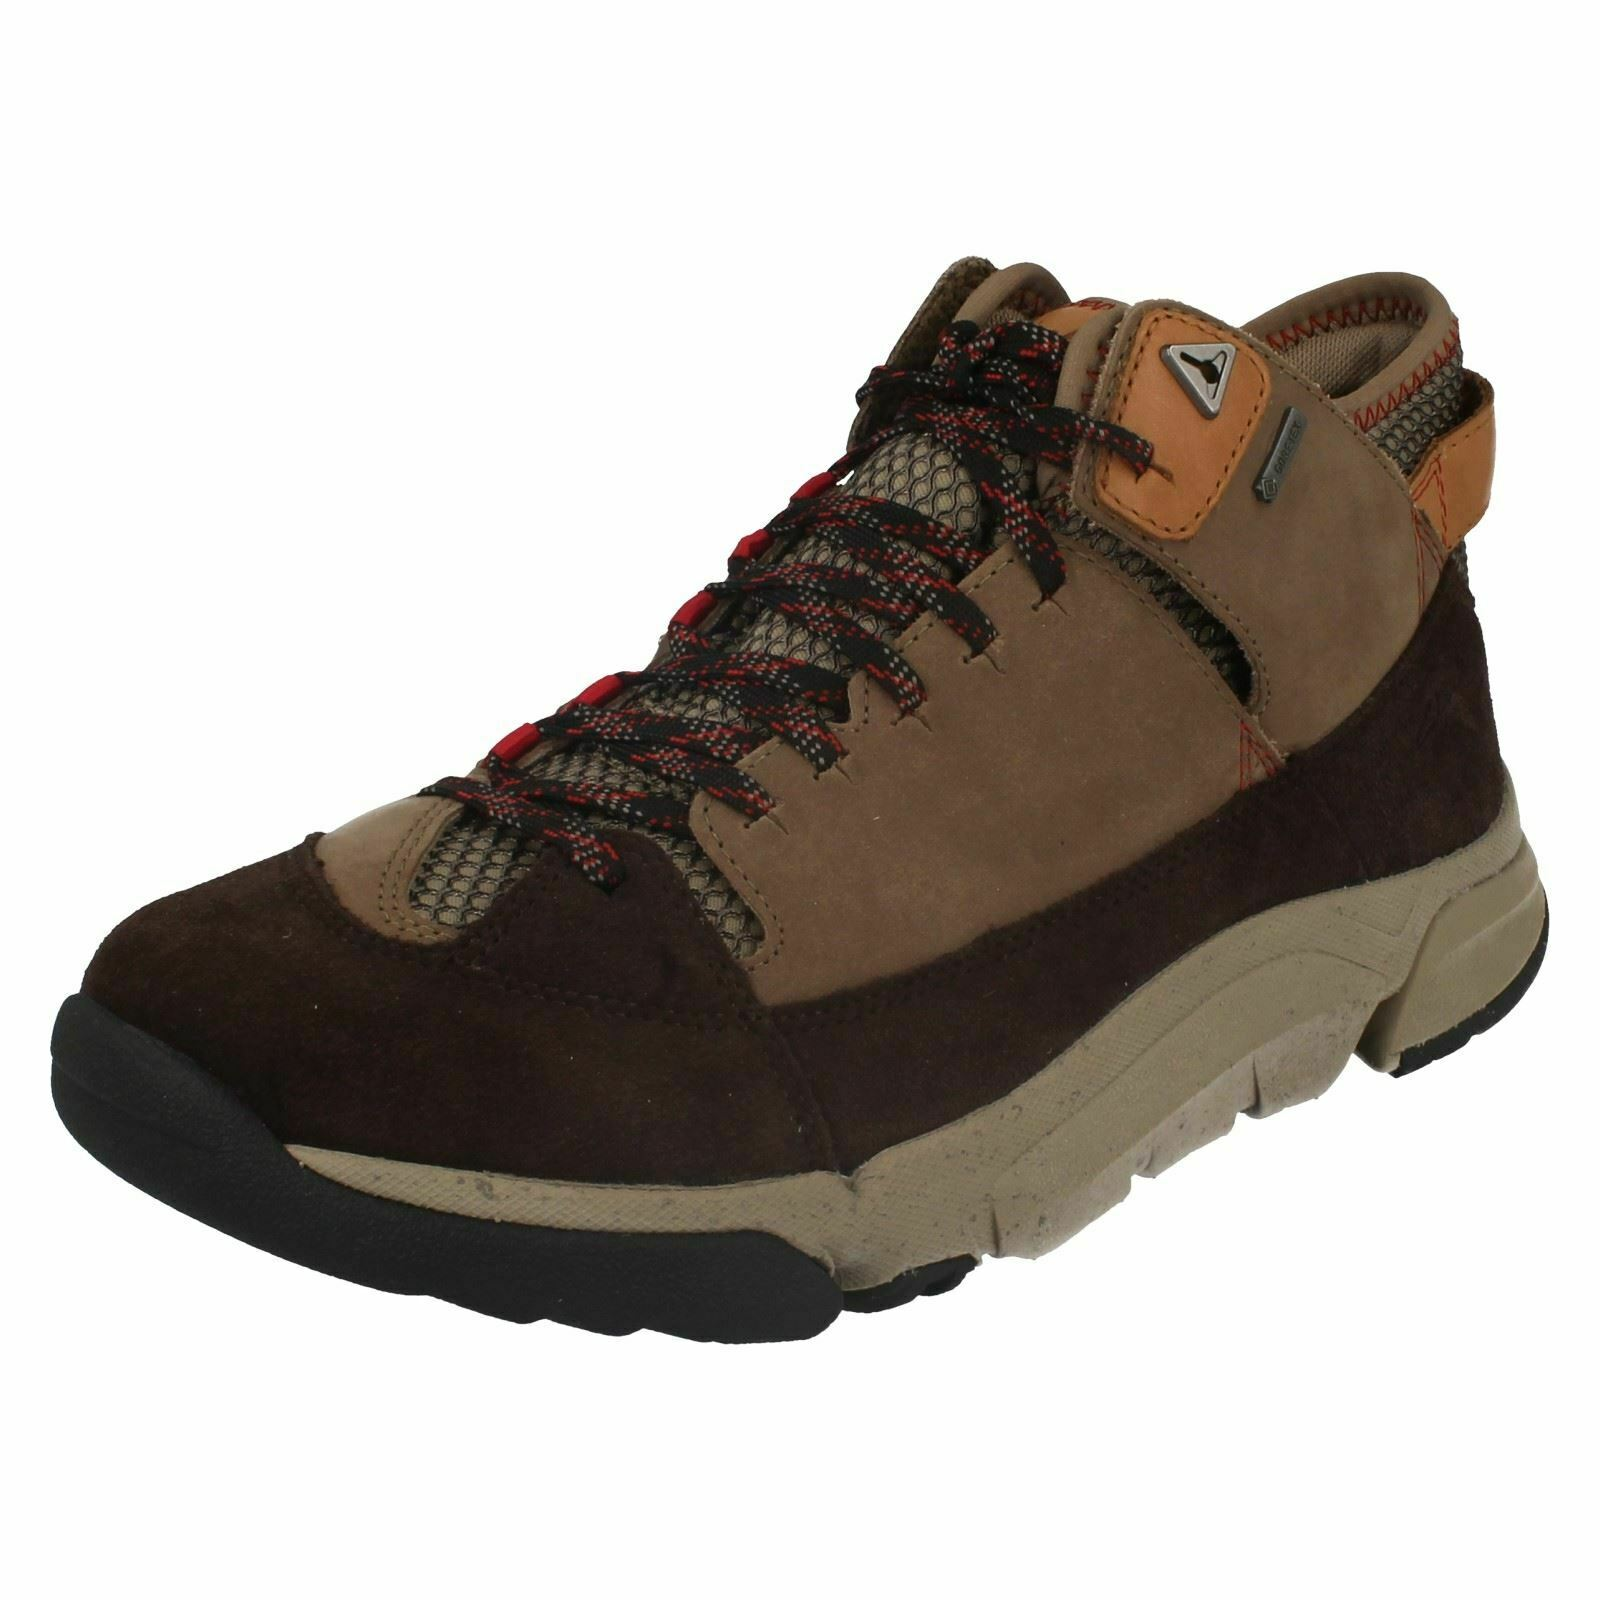 Mens Clarks Outdoor Gore-Tex Boots Tri Outflex GTX